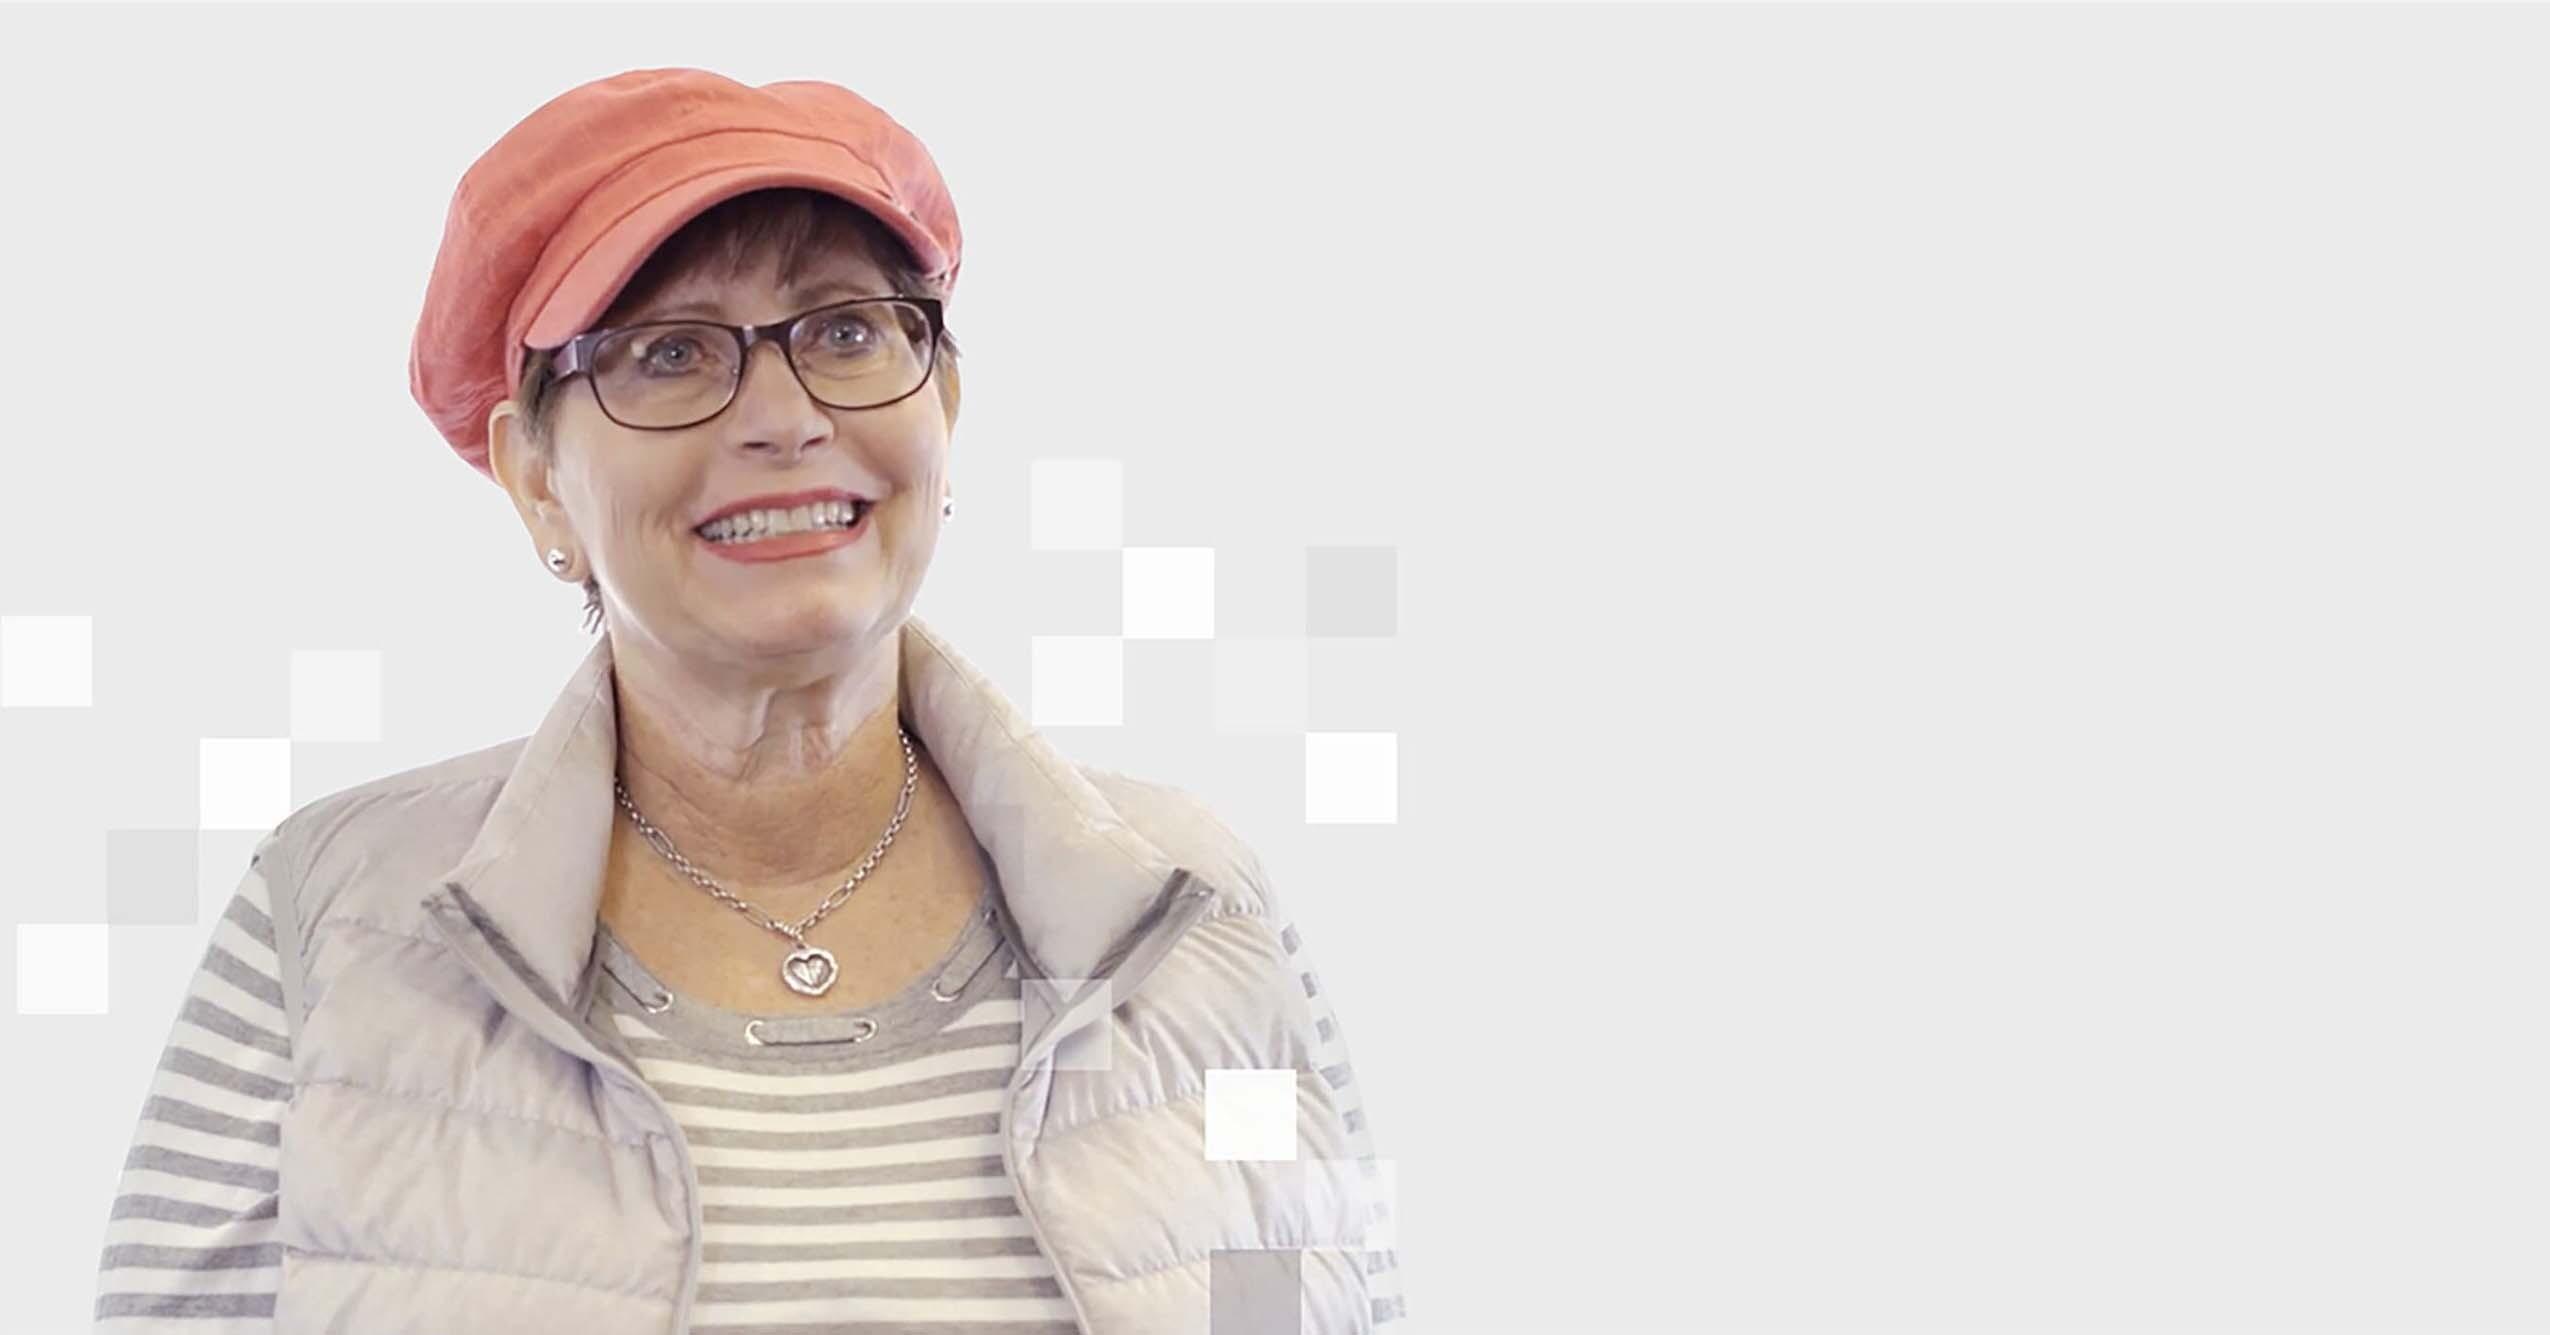 Joyanne Ferrara, Kidney transplant recipient